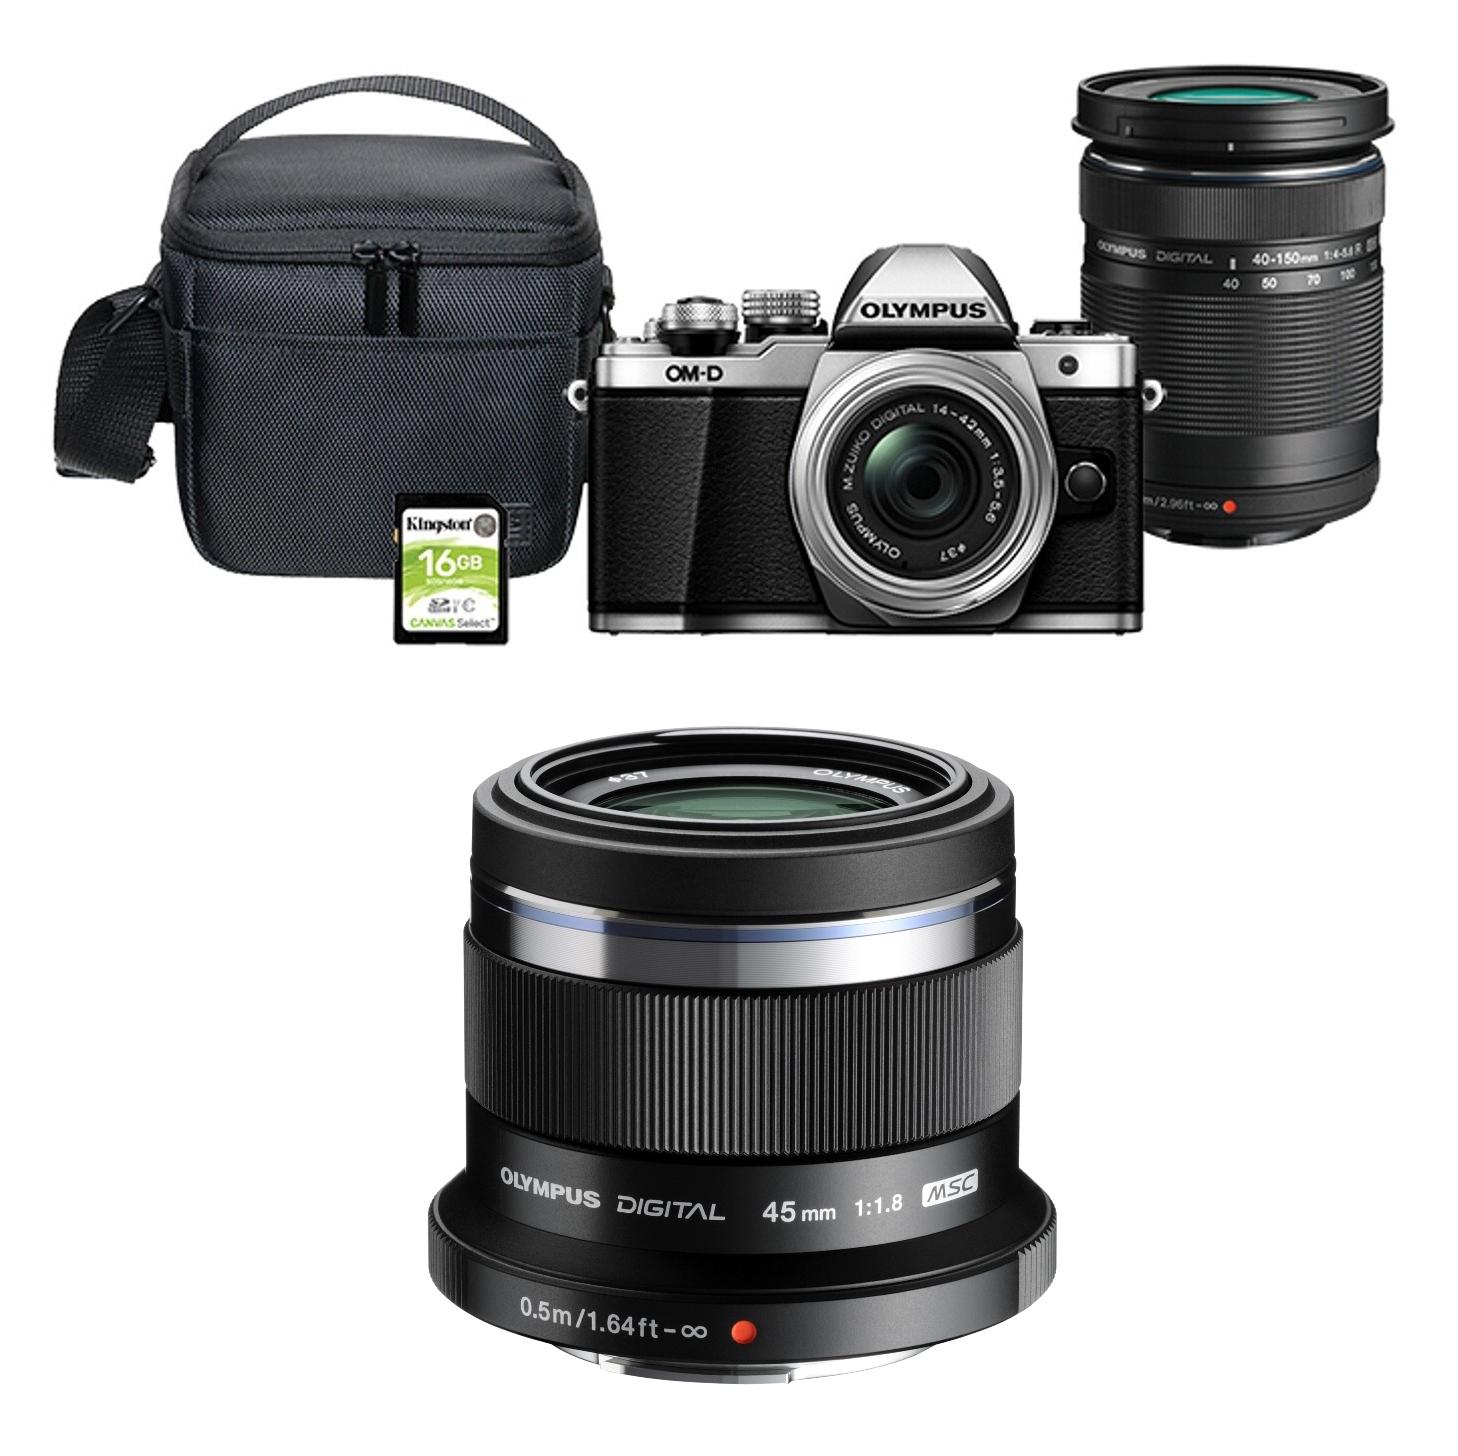 Appareil photo Hybride Olympus E-M10 Mark II Silver + 3 Objectifs M.Zuiko Digital (14-42mm + 40-150mm + 45mm f/1.8) + Sacoche + SD 16 Go